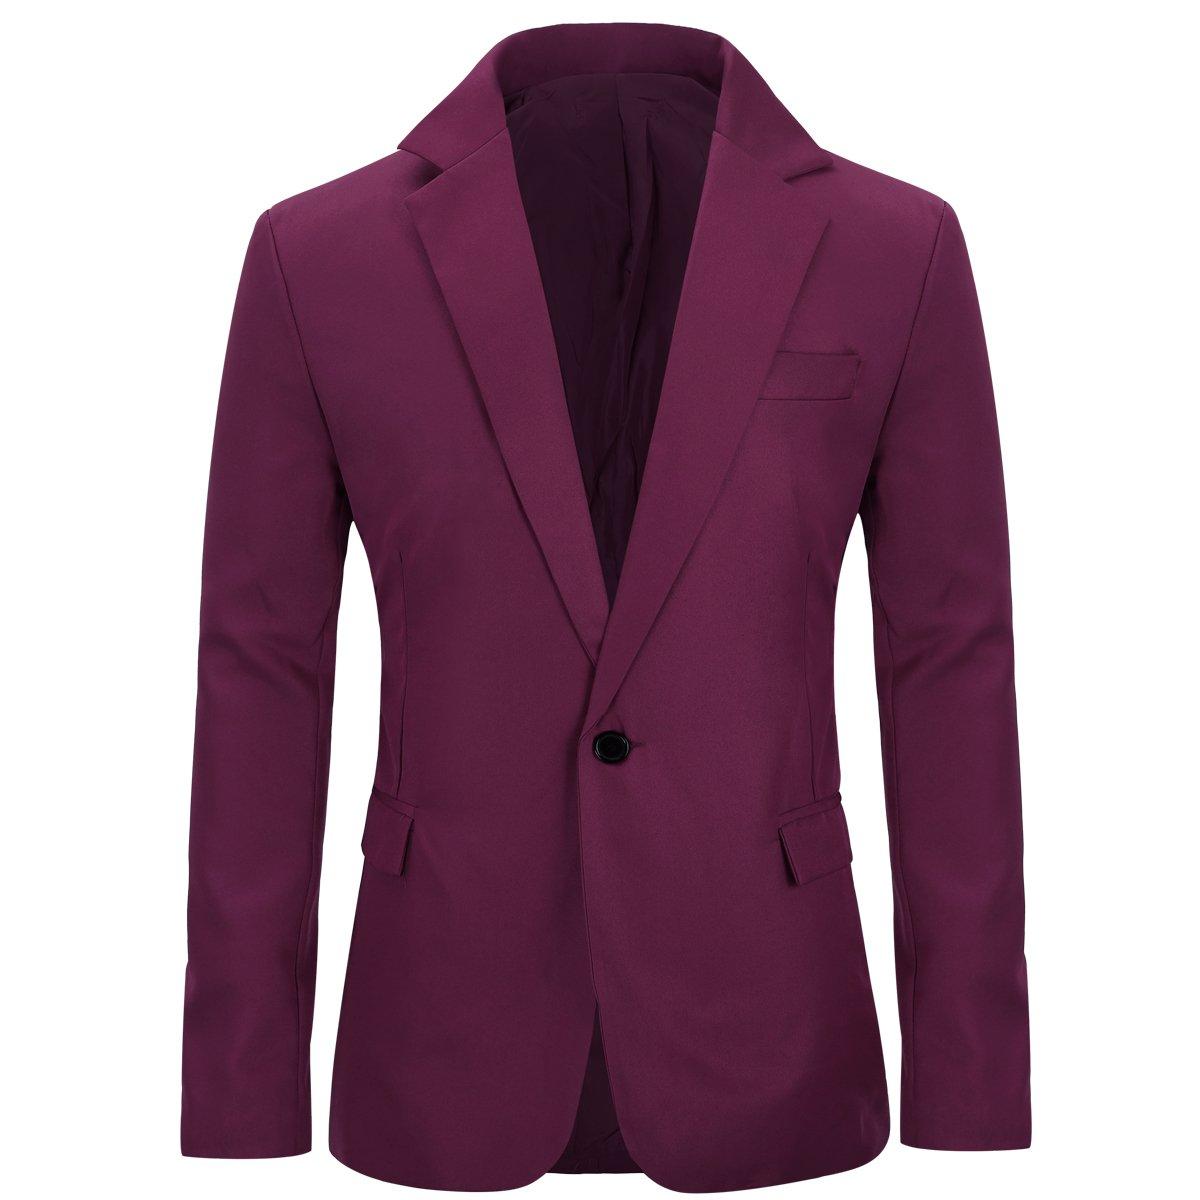 Men's Slim Fit Casual One Button Notched Lapel Blazer Jacket (Burgundy, XL)